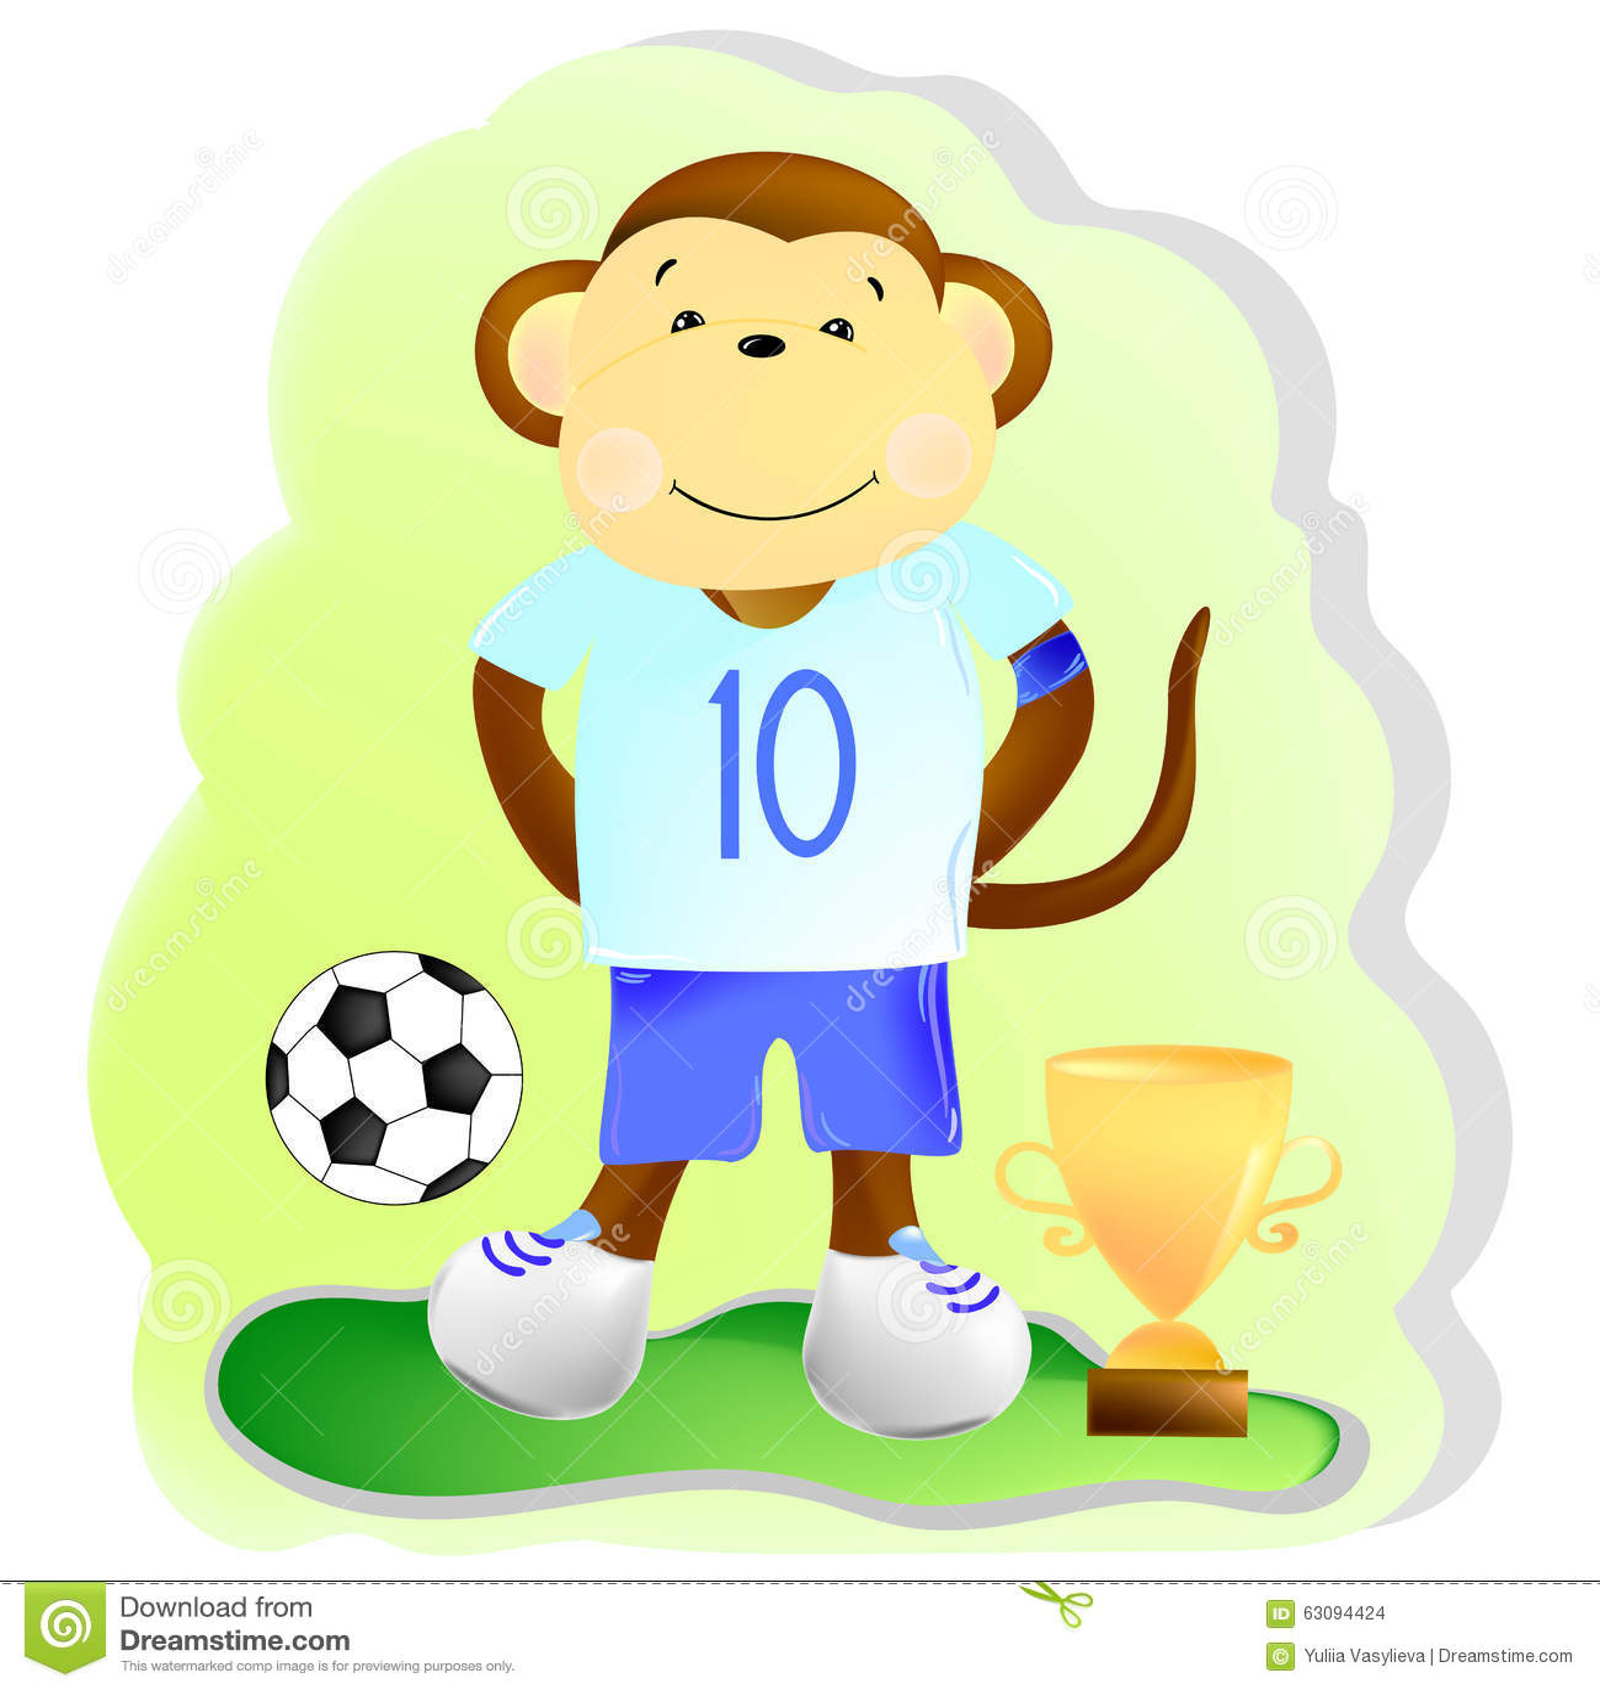 monkey player